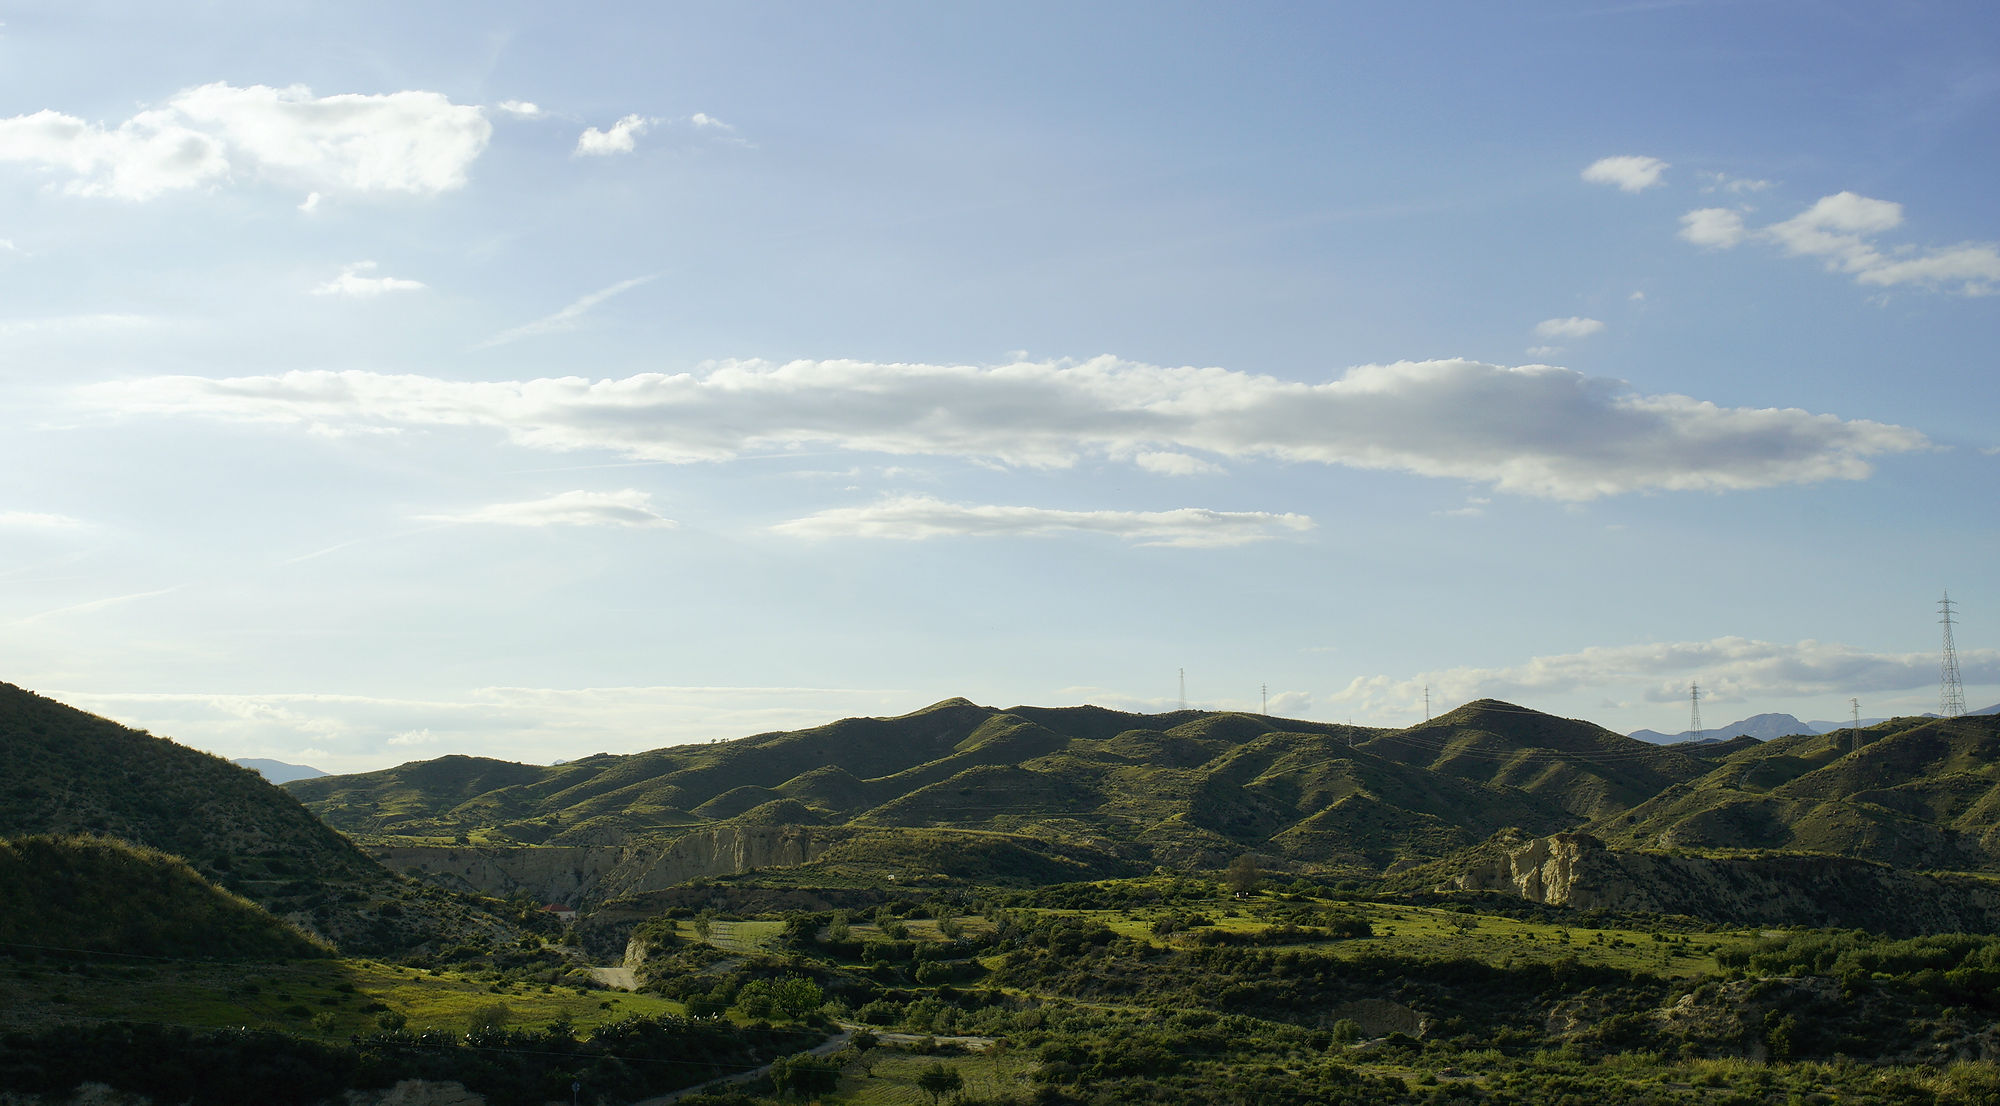 * Abend in der Sierra de Filabres *